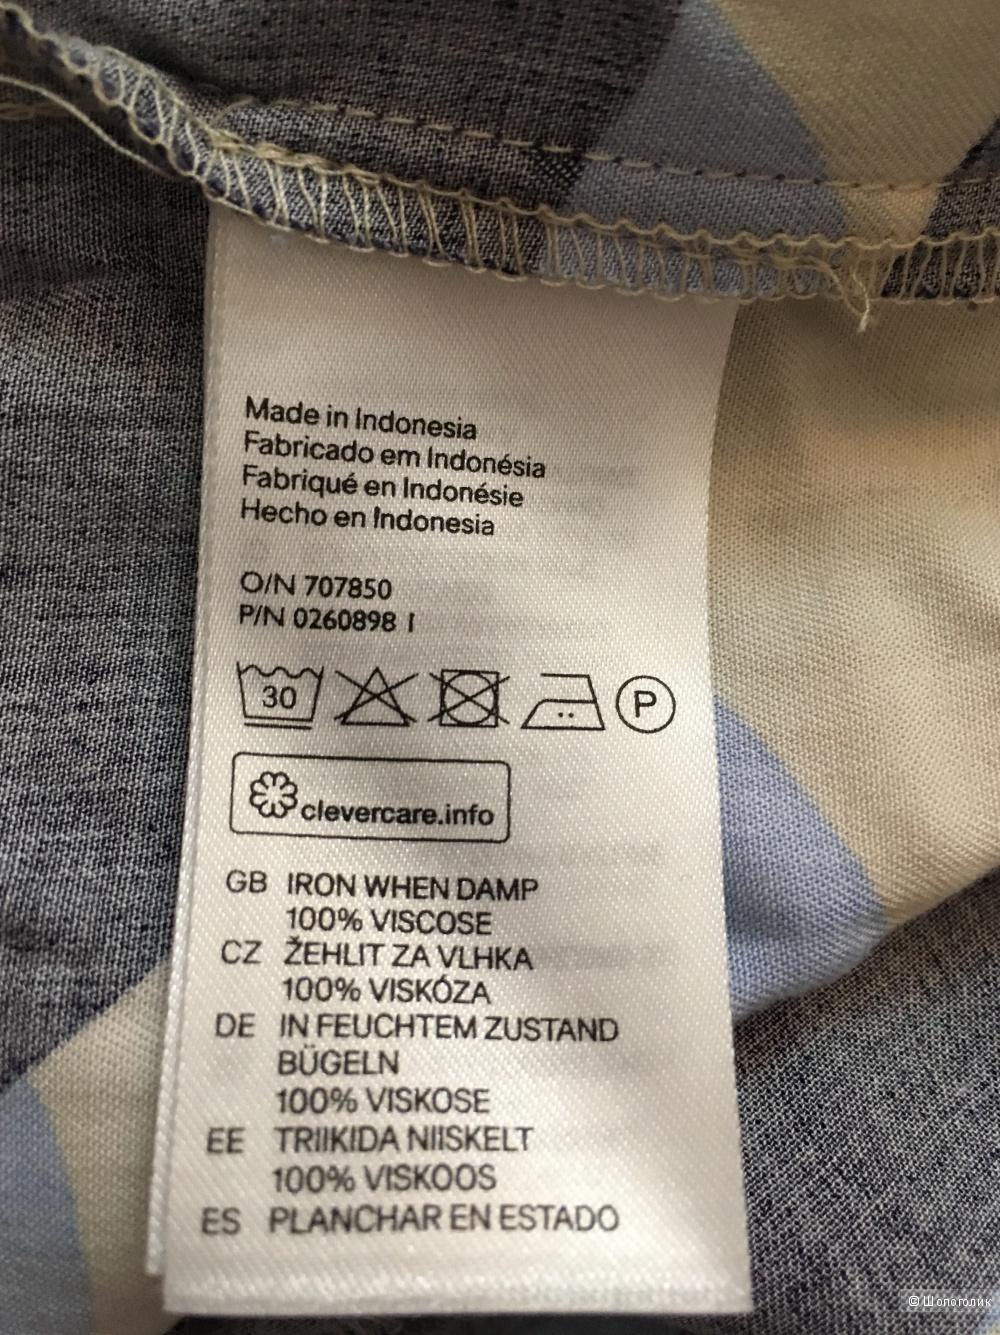 Комбинезон H&M, 8 US, рос.44-46